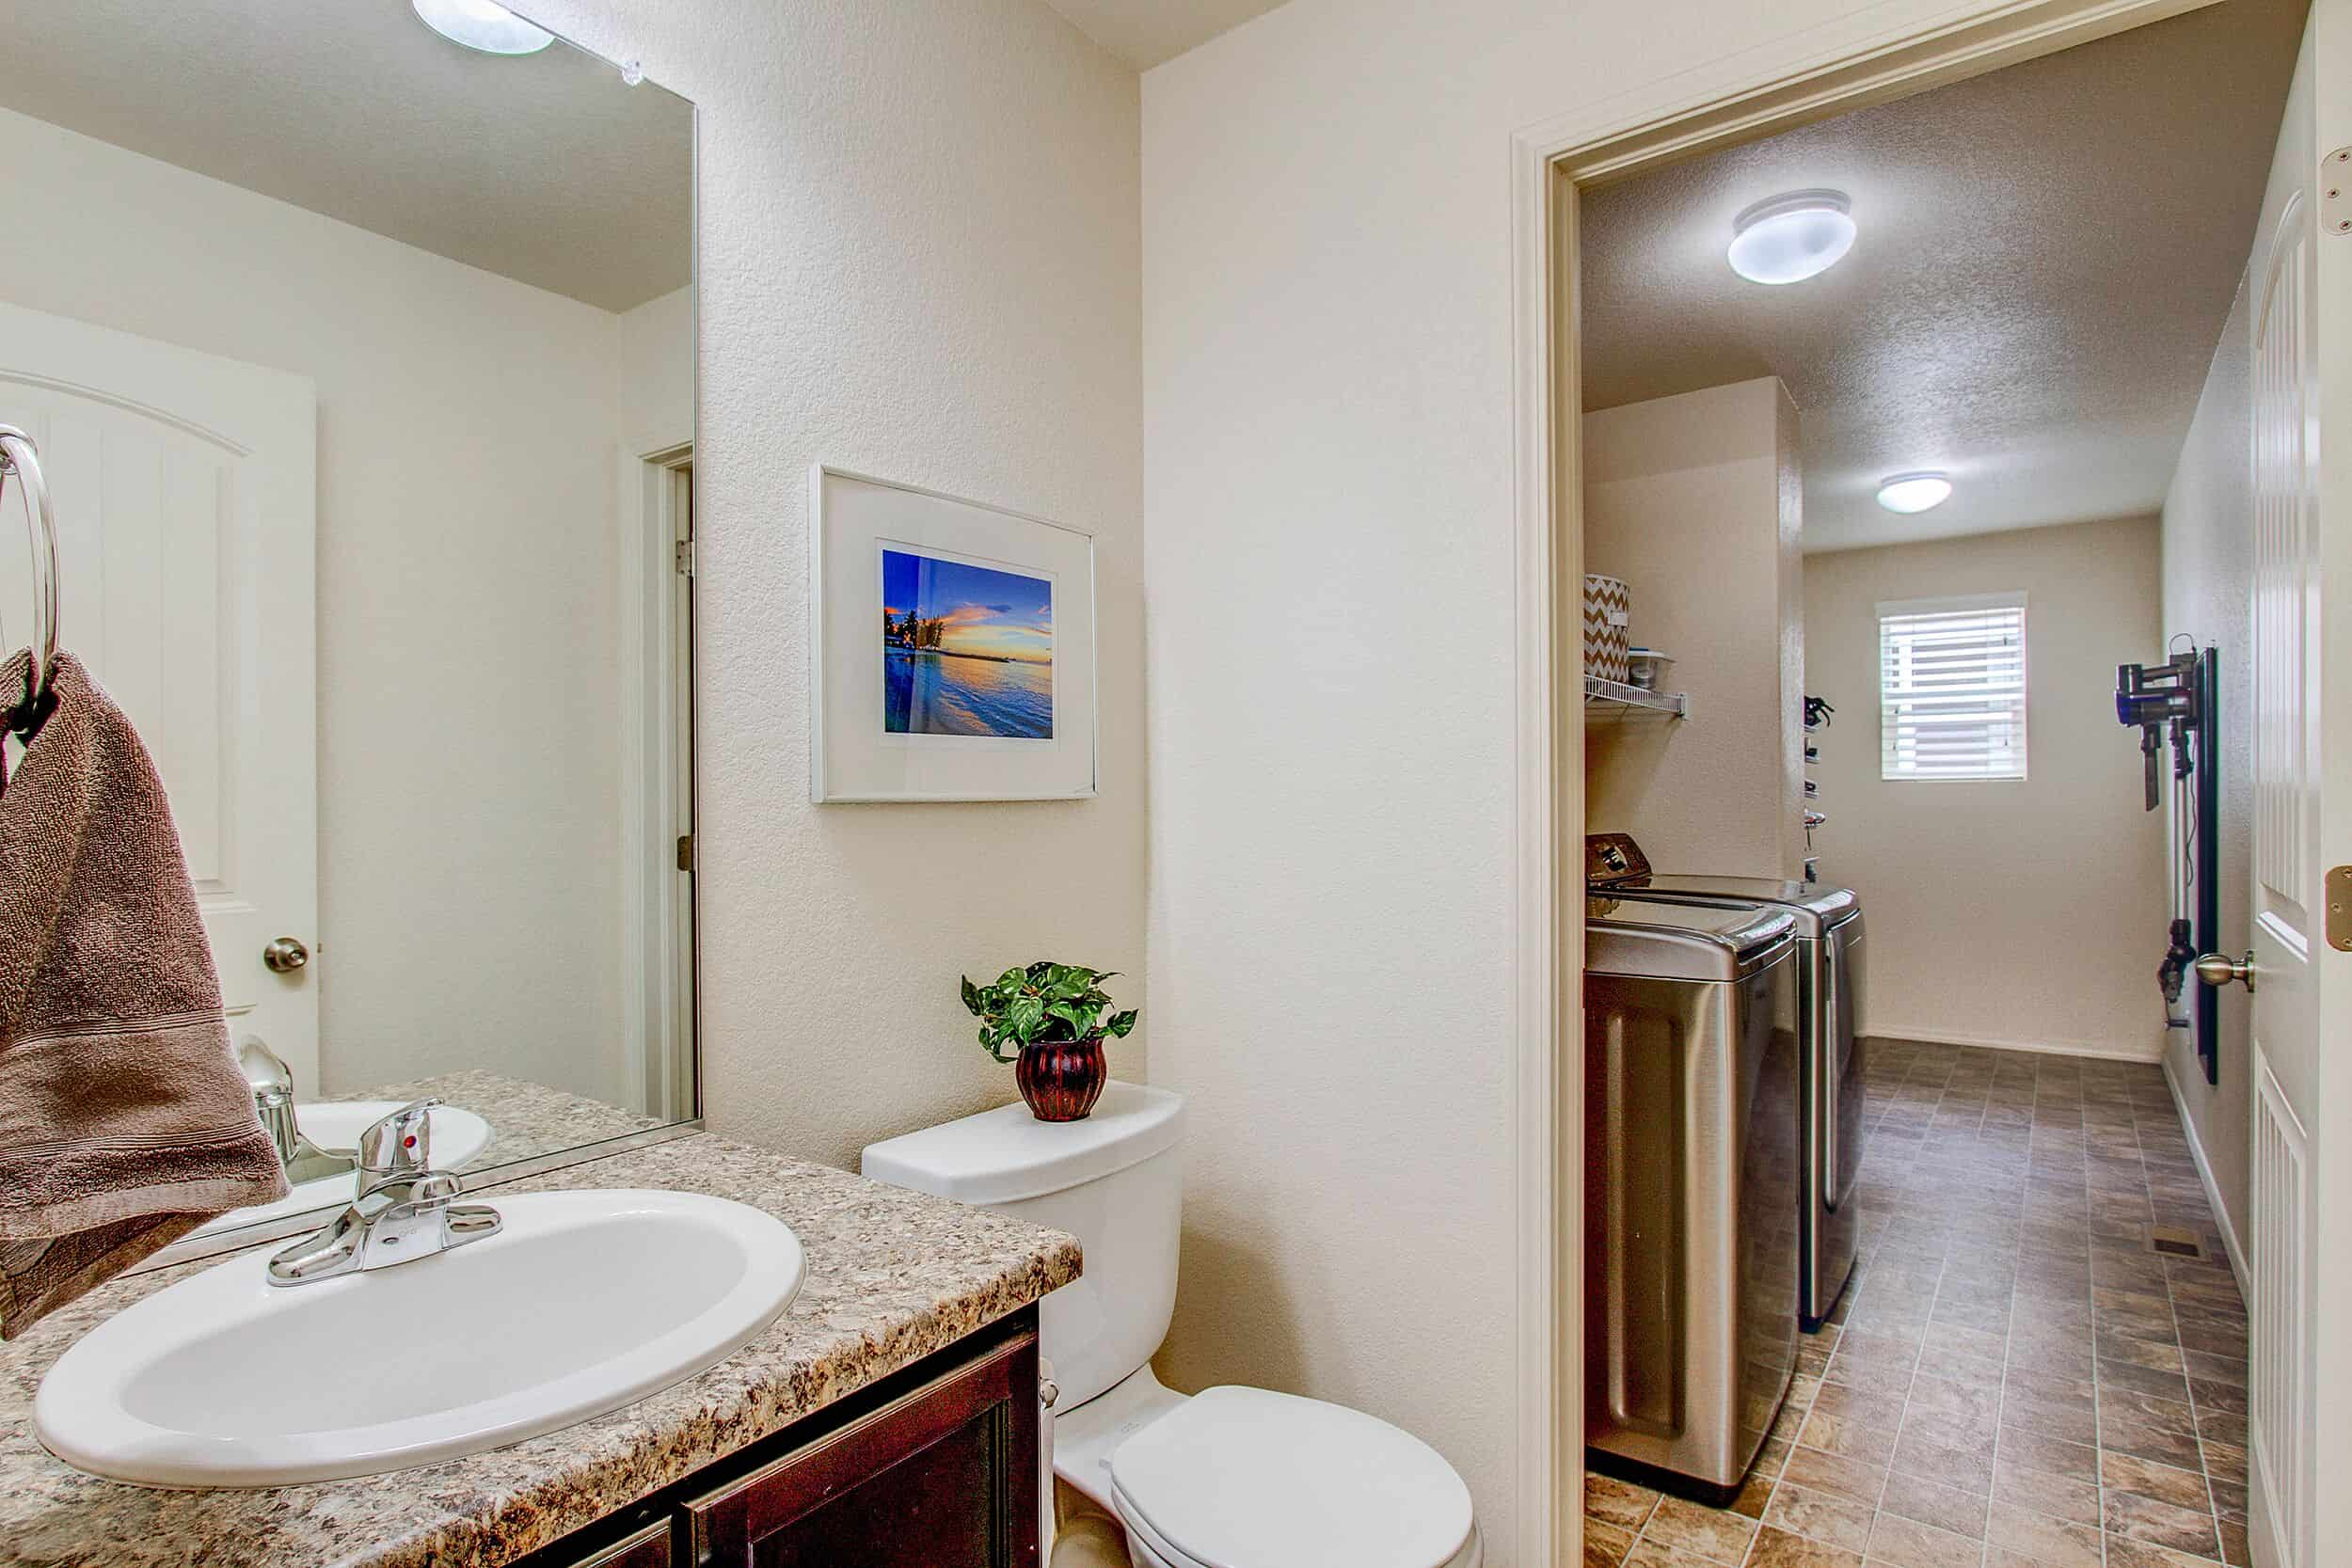 Powder Bathroom and Laundry Room